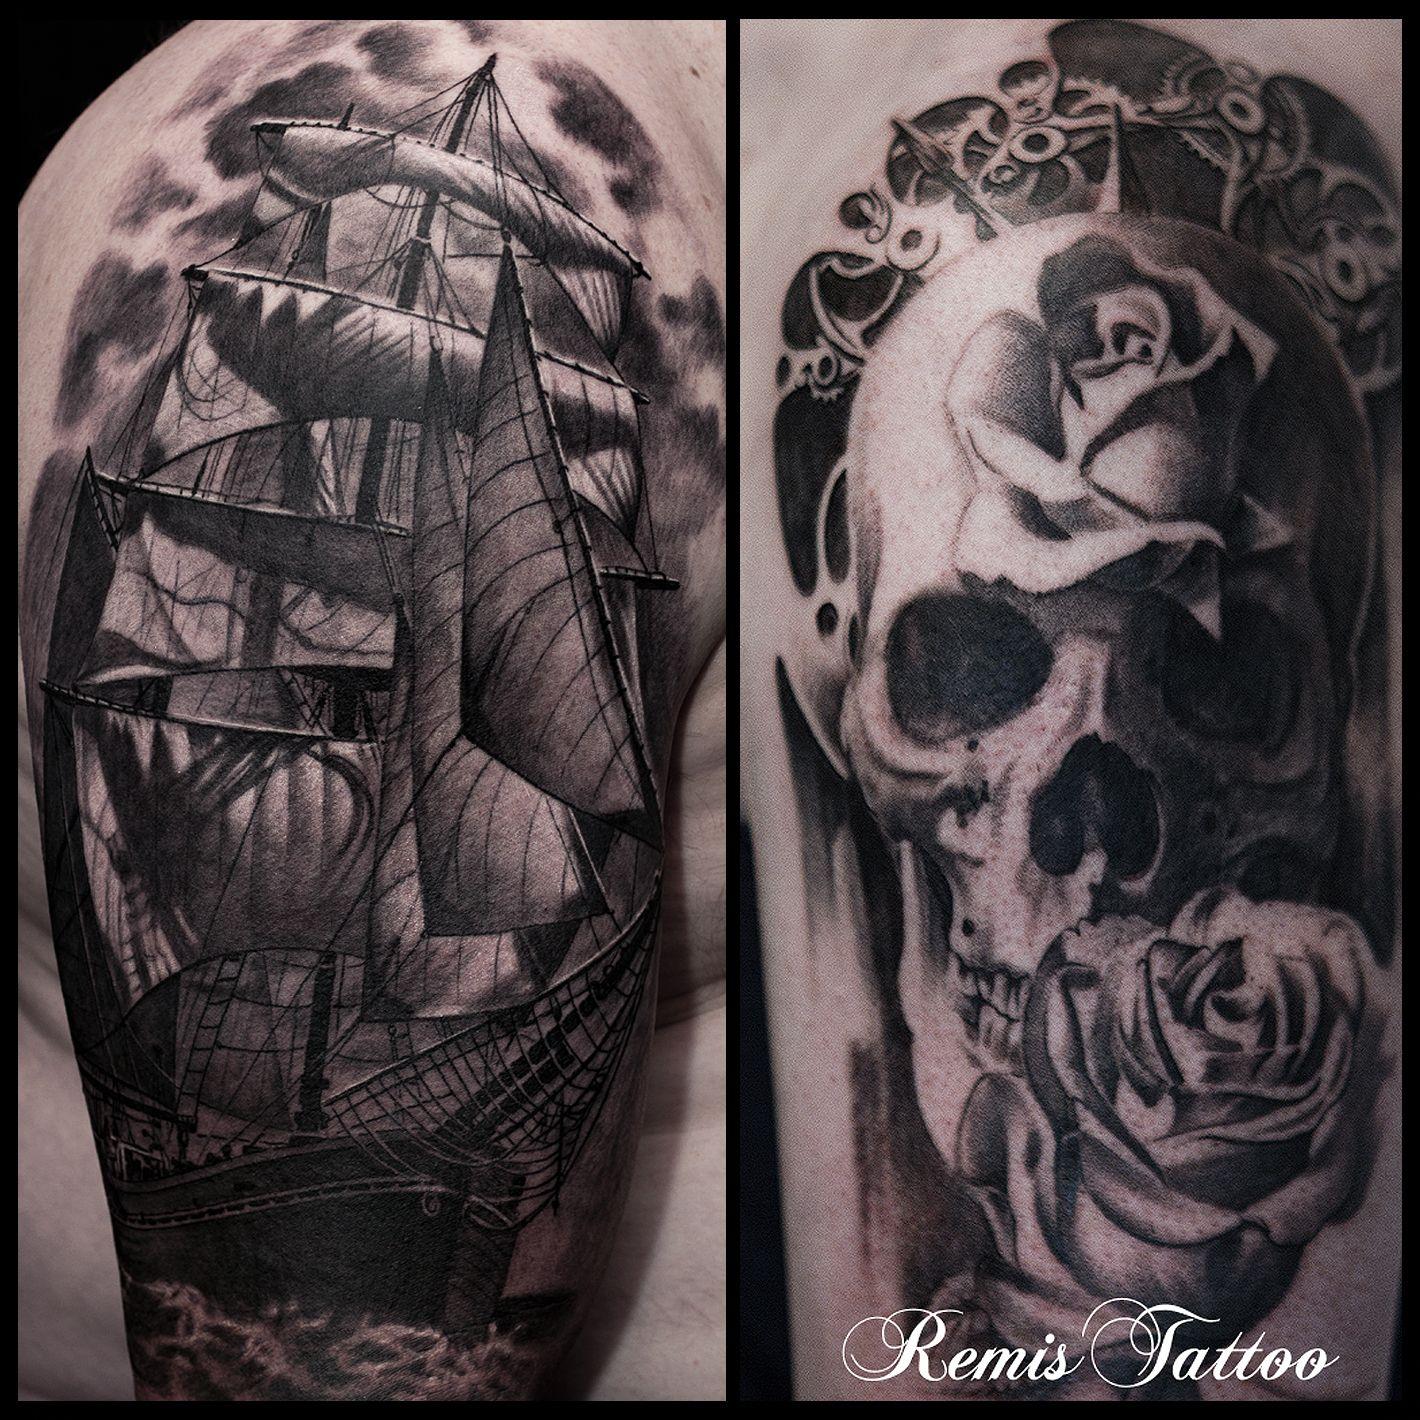 Ship And Skull Tattoo Black And Grey Tattoo By Remis Remistattoo Realism Realistic Tattoo Tattoo Ideas Inspira Tattoos Black And Grey Tattoos Ship Tattoo